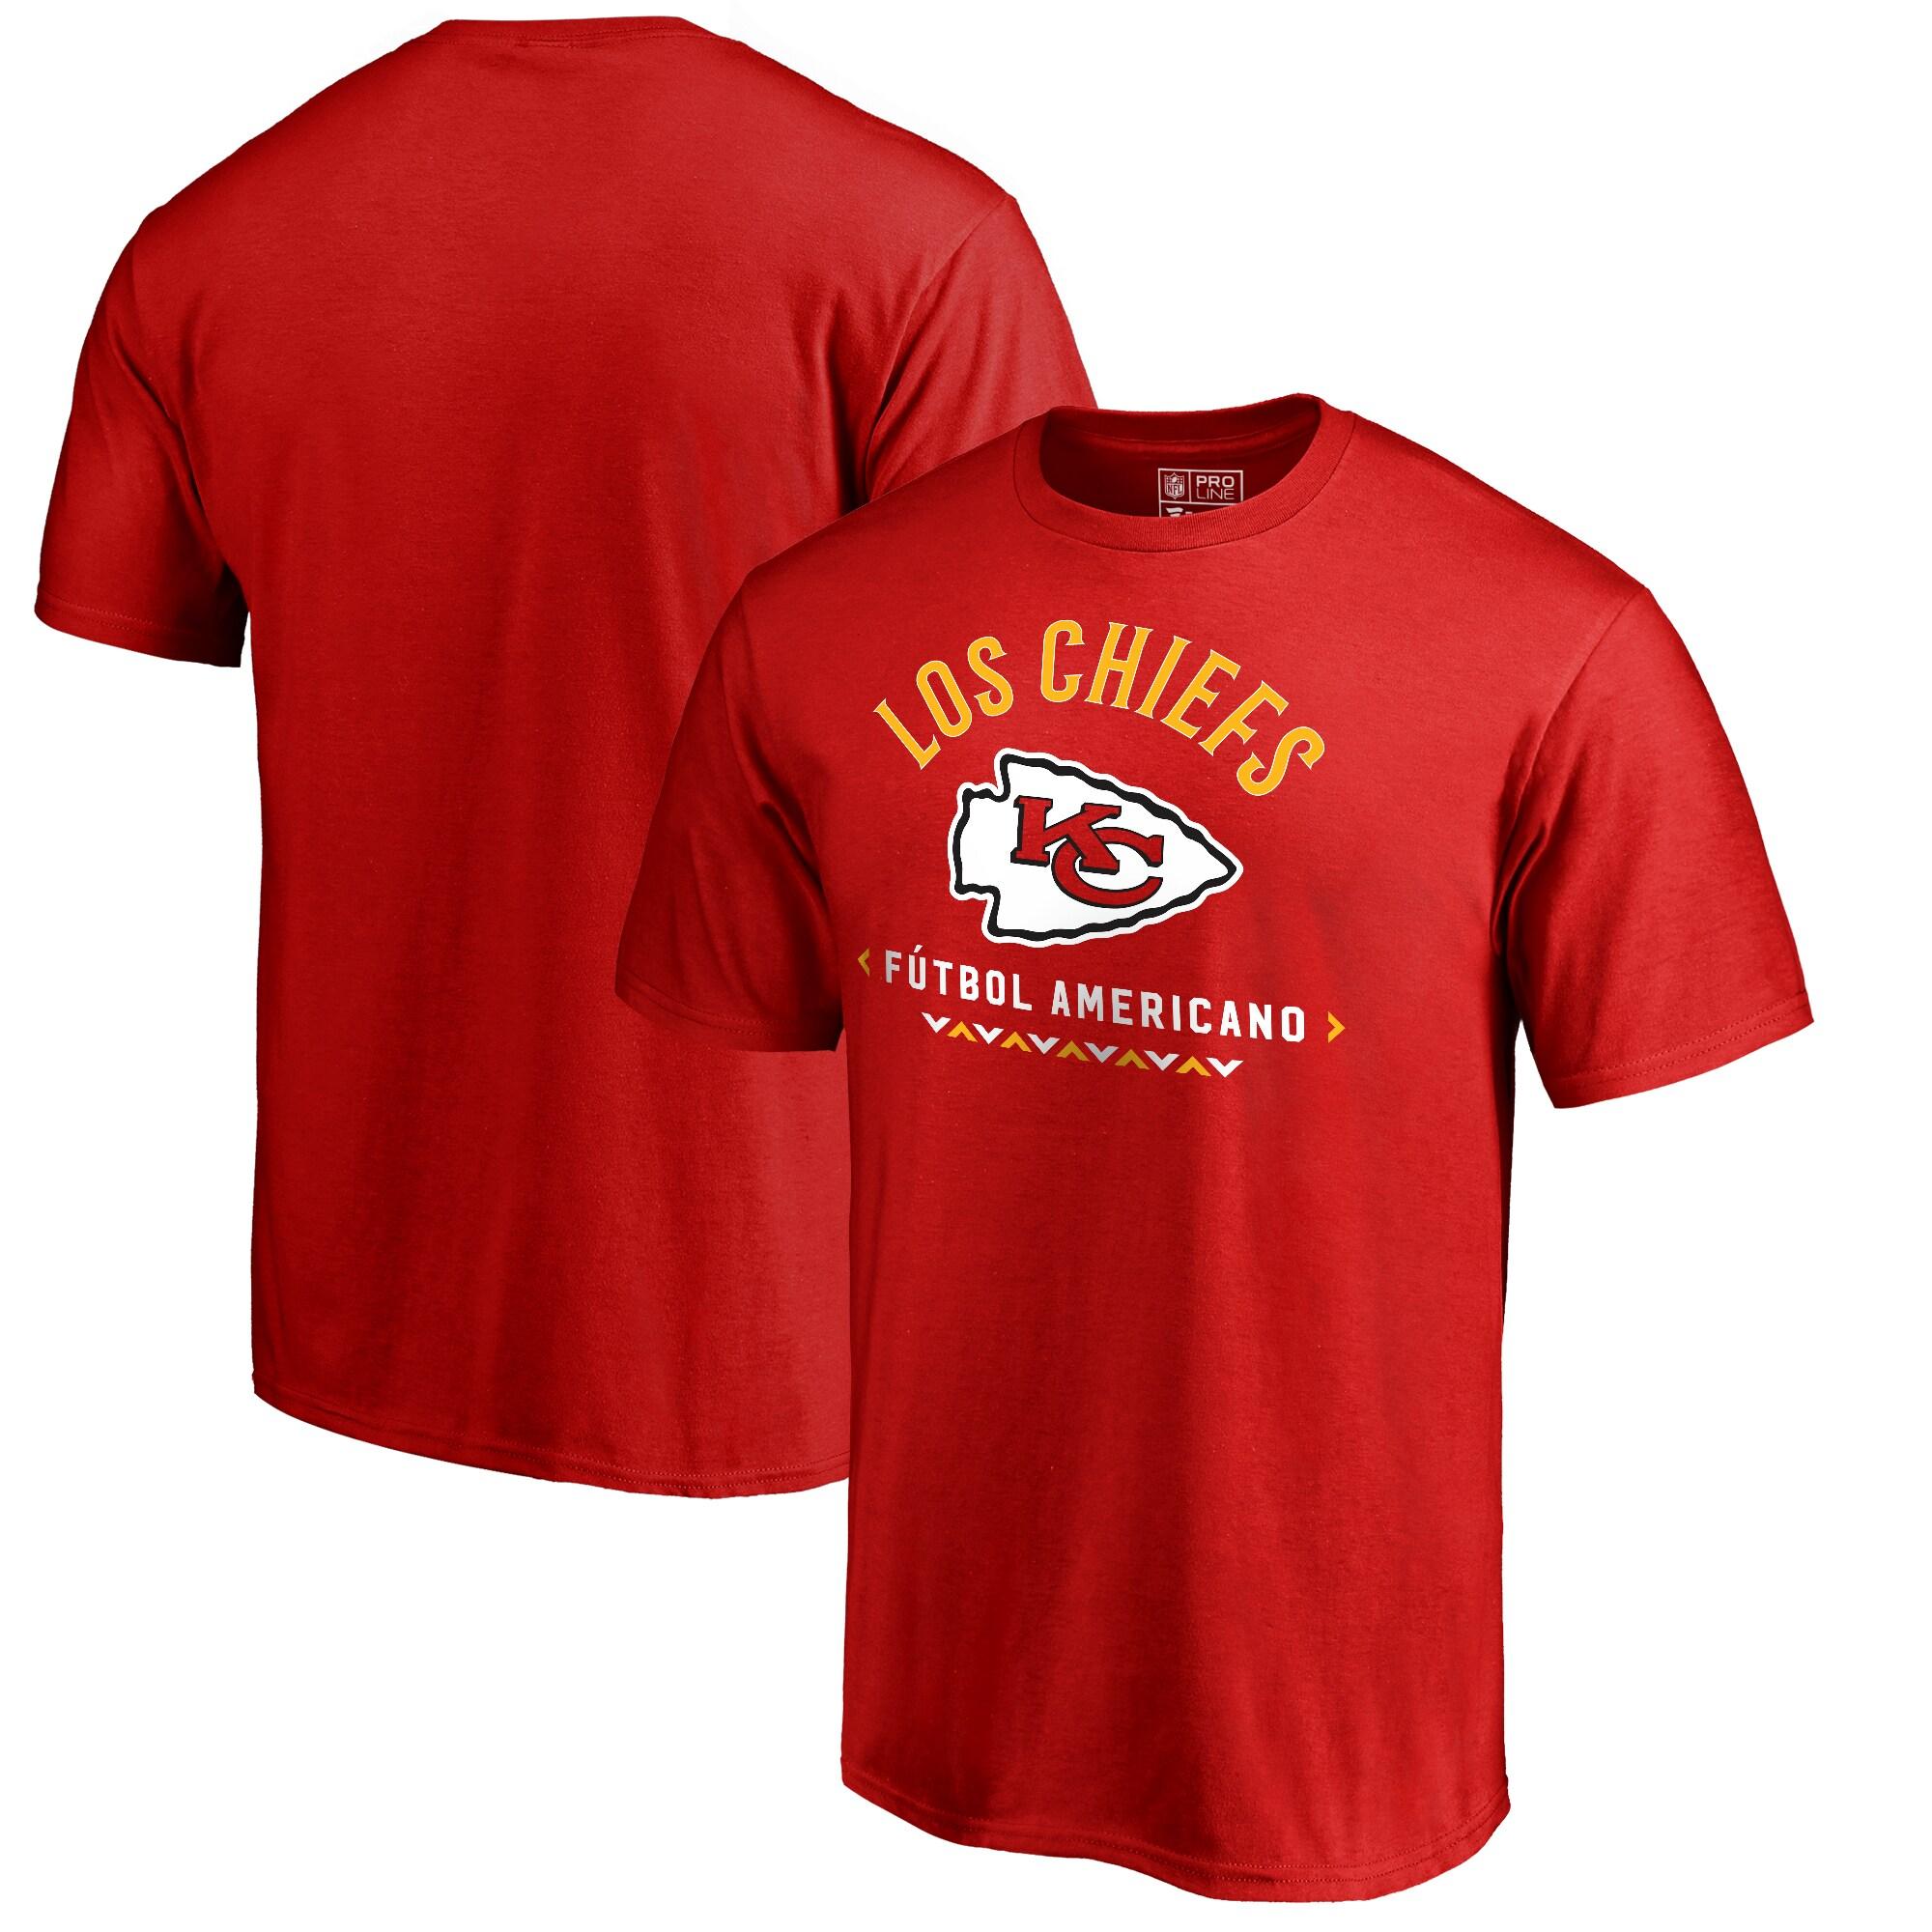 Kansas City Chiefs NFL Pro Line by Fanatics Branded Futbol Americano Big & Tall T-Shirt - Red